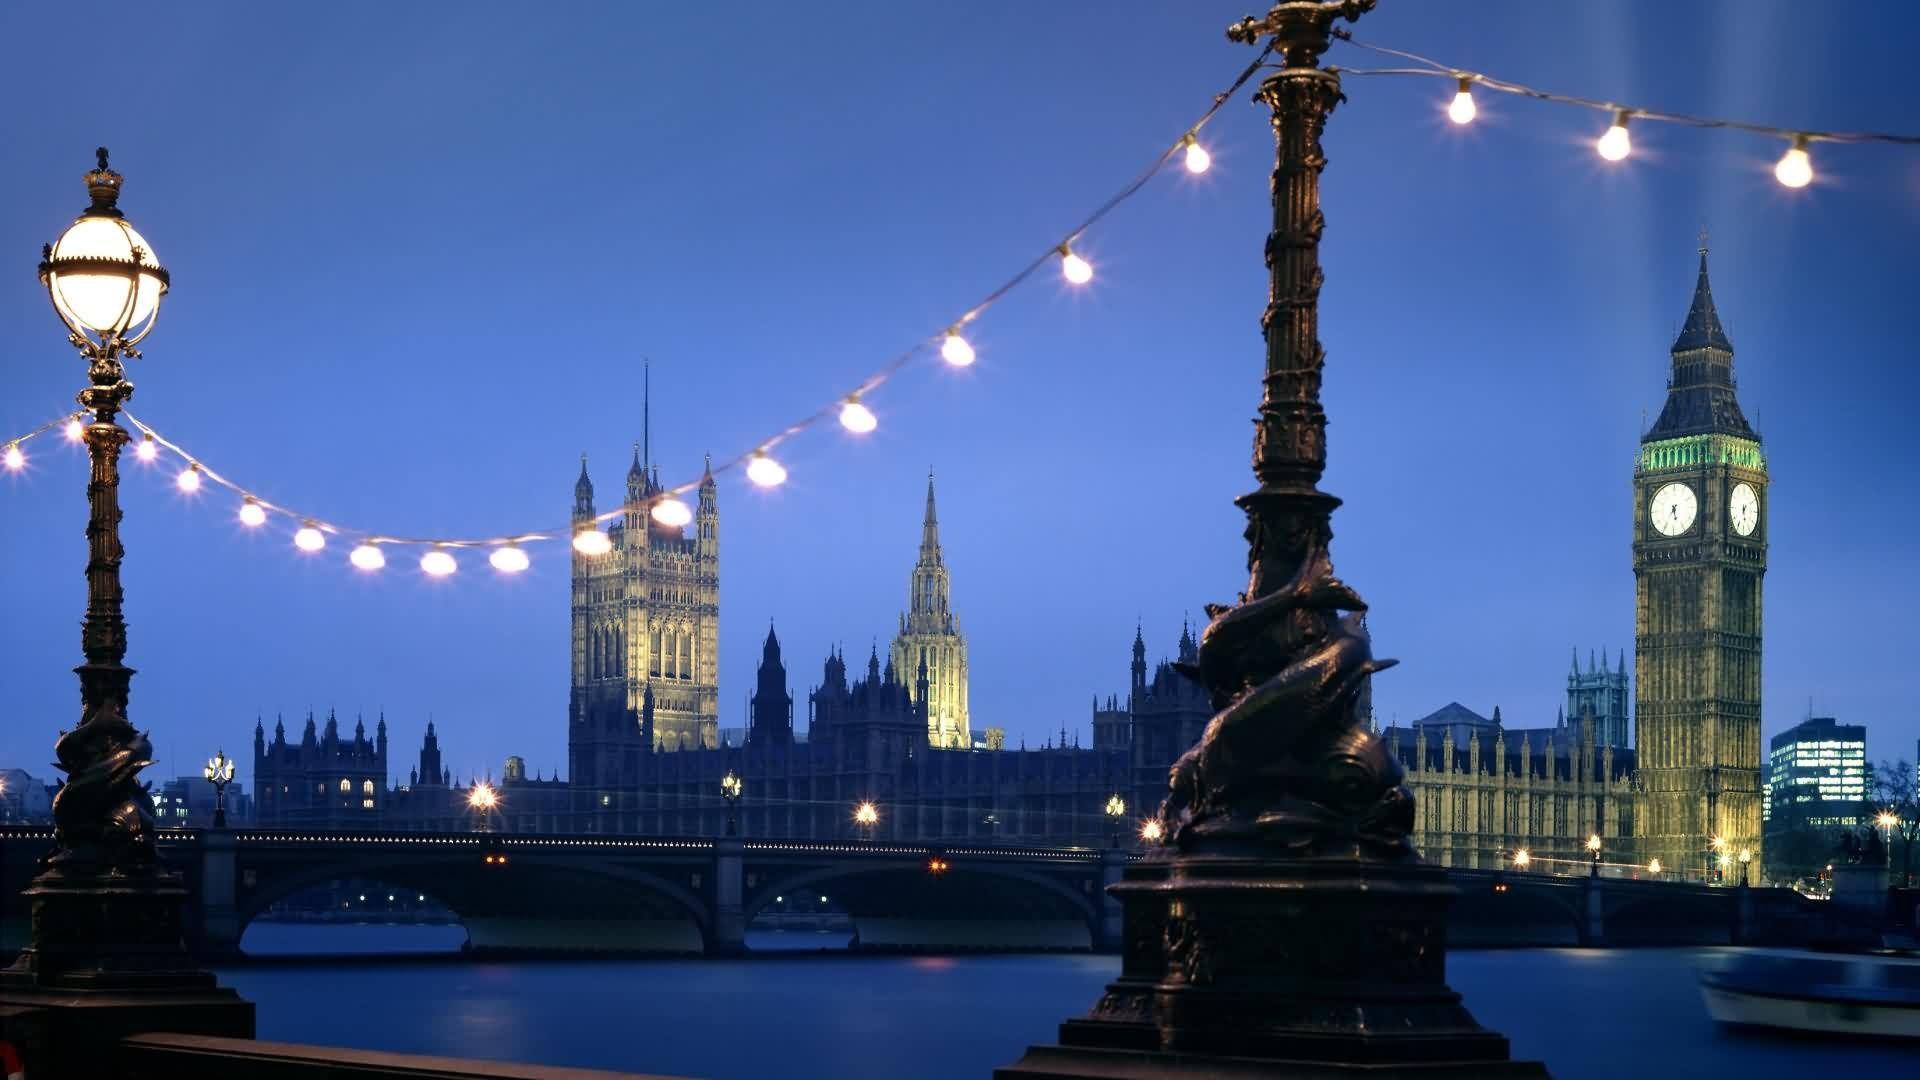 london england wallpapers | night, london, englanddesktop wallpaper